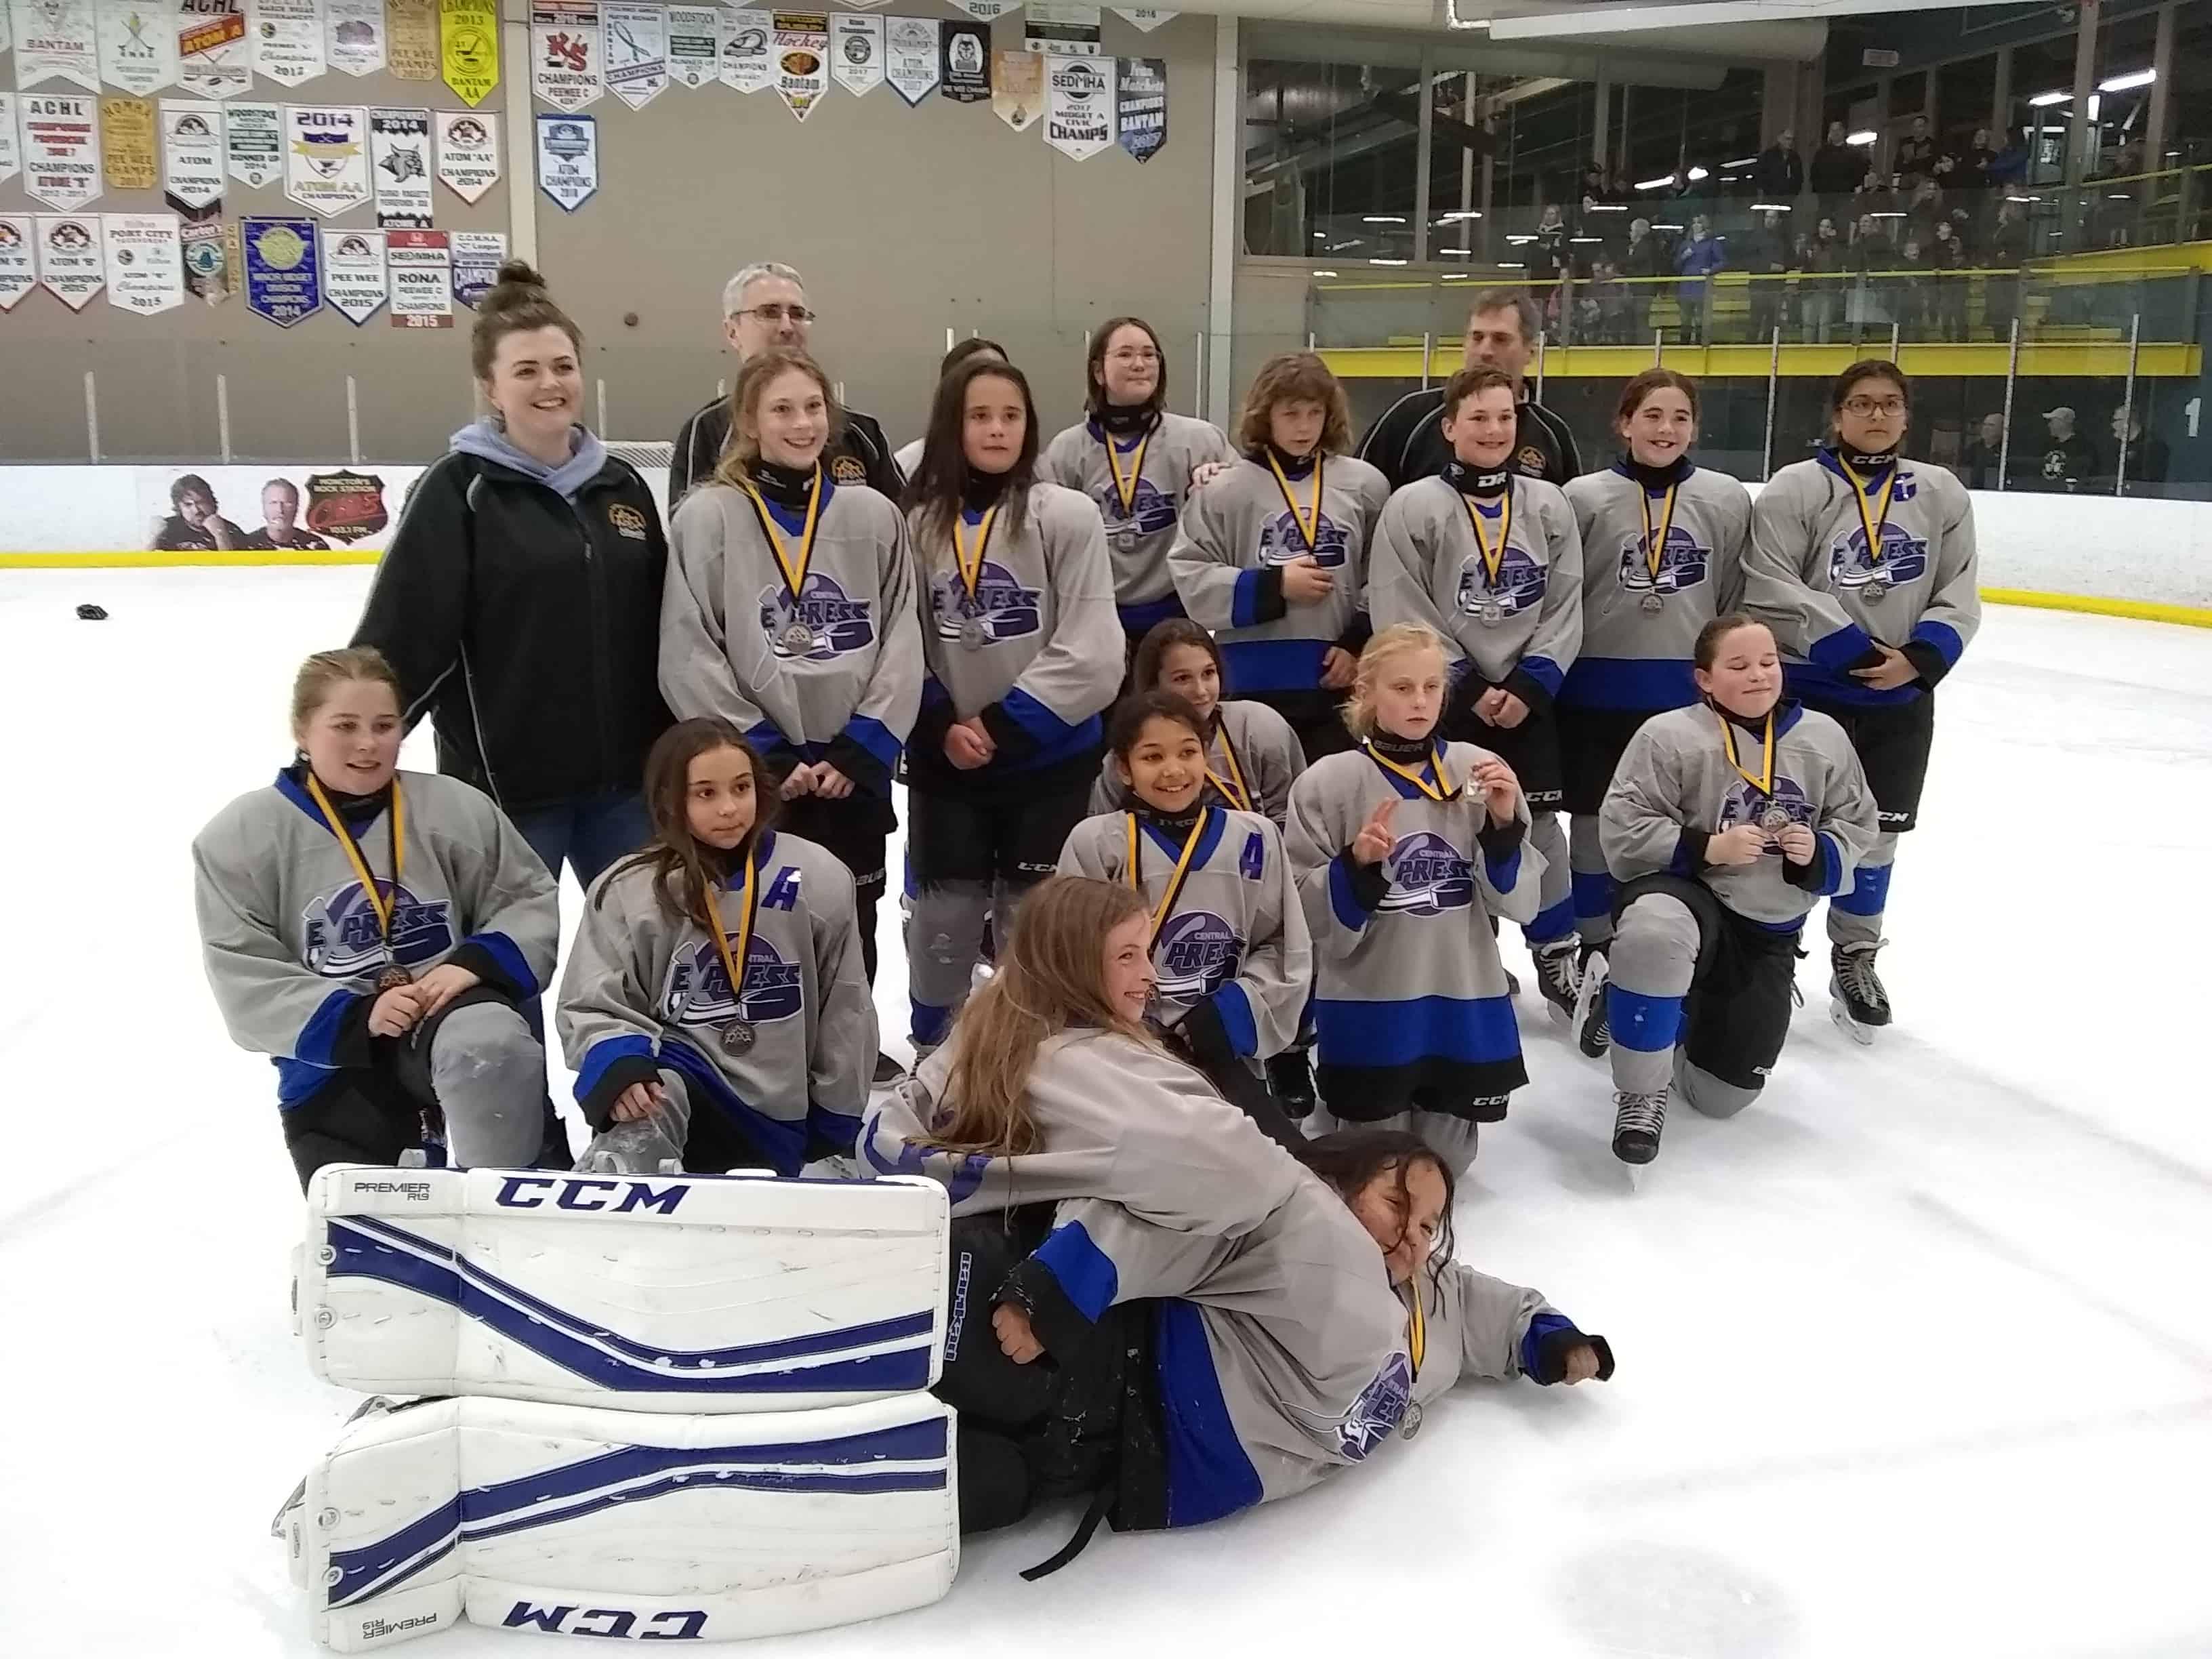 Express Atlantic Hockey Group